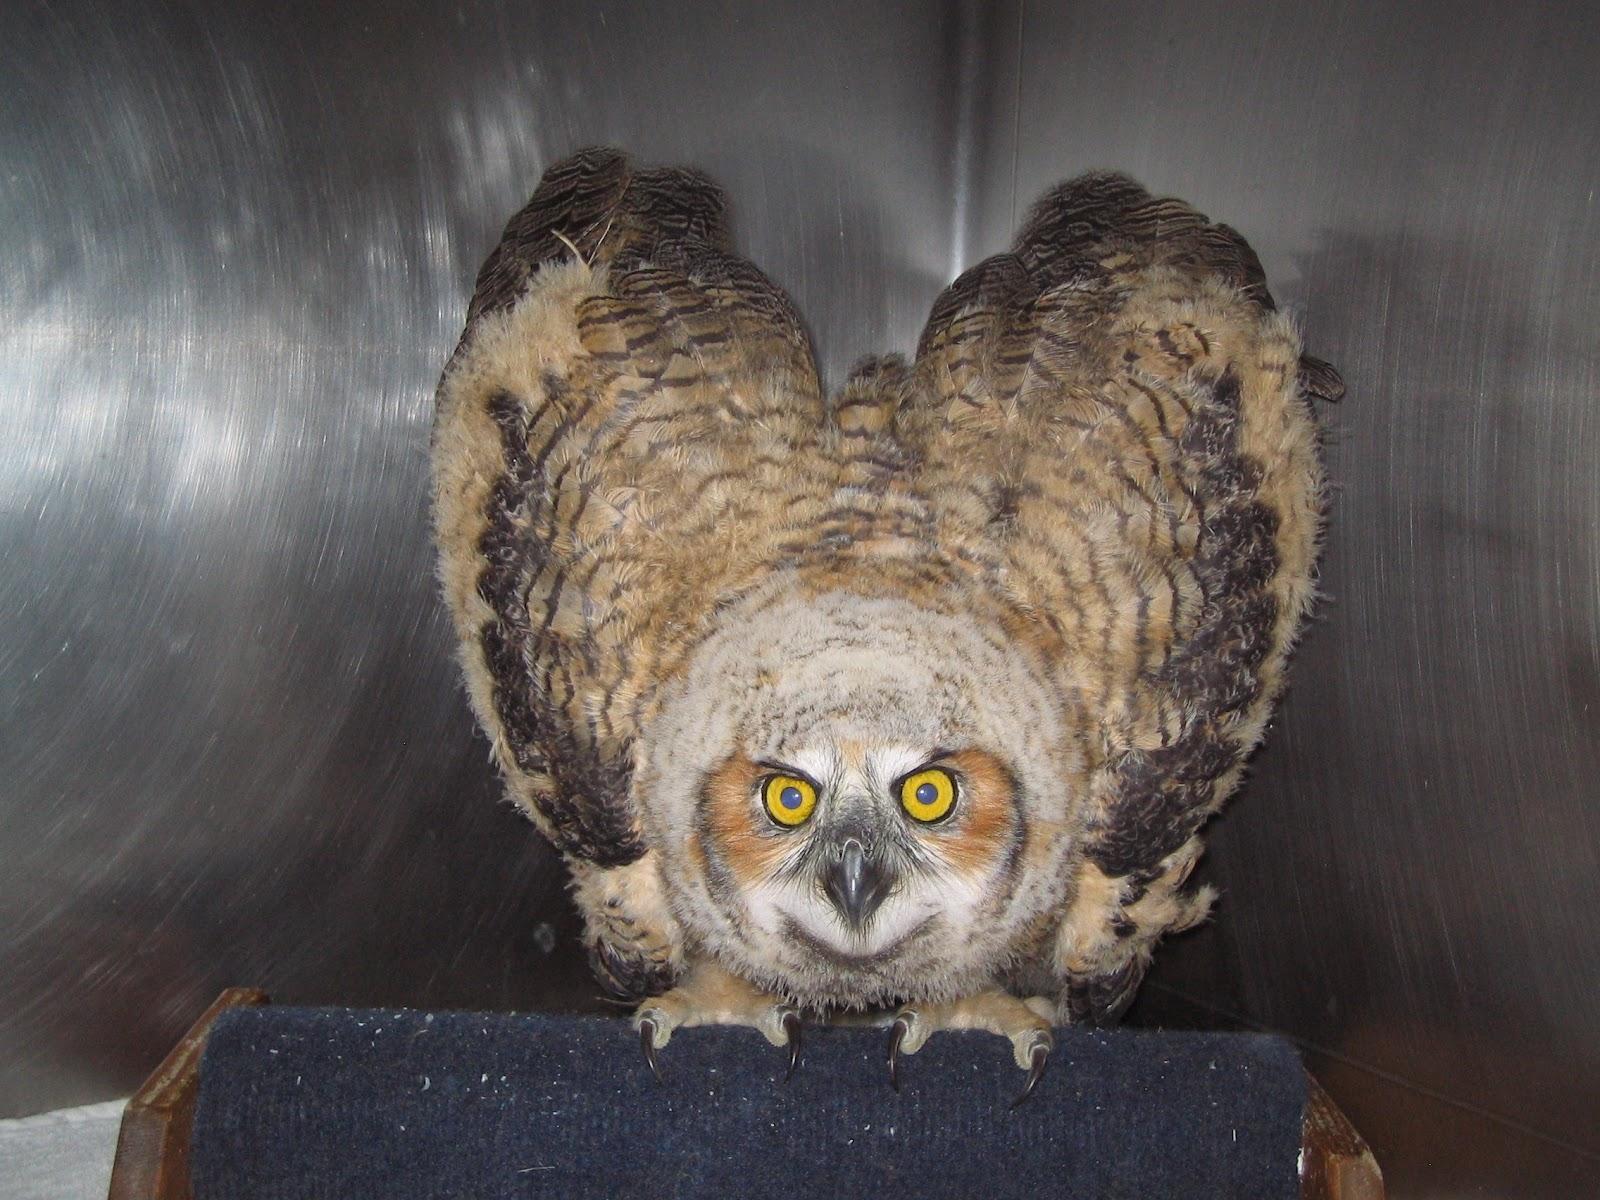 Young great horned owl young great horned owl